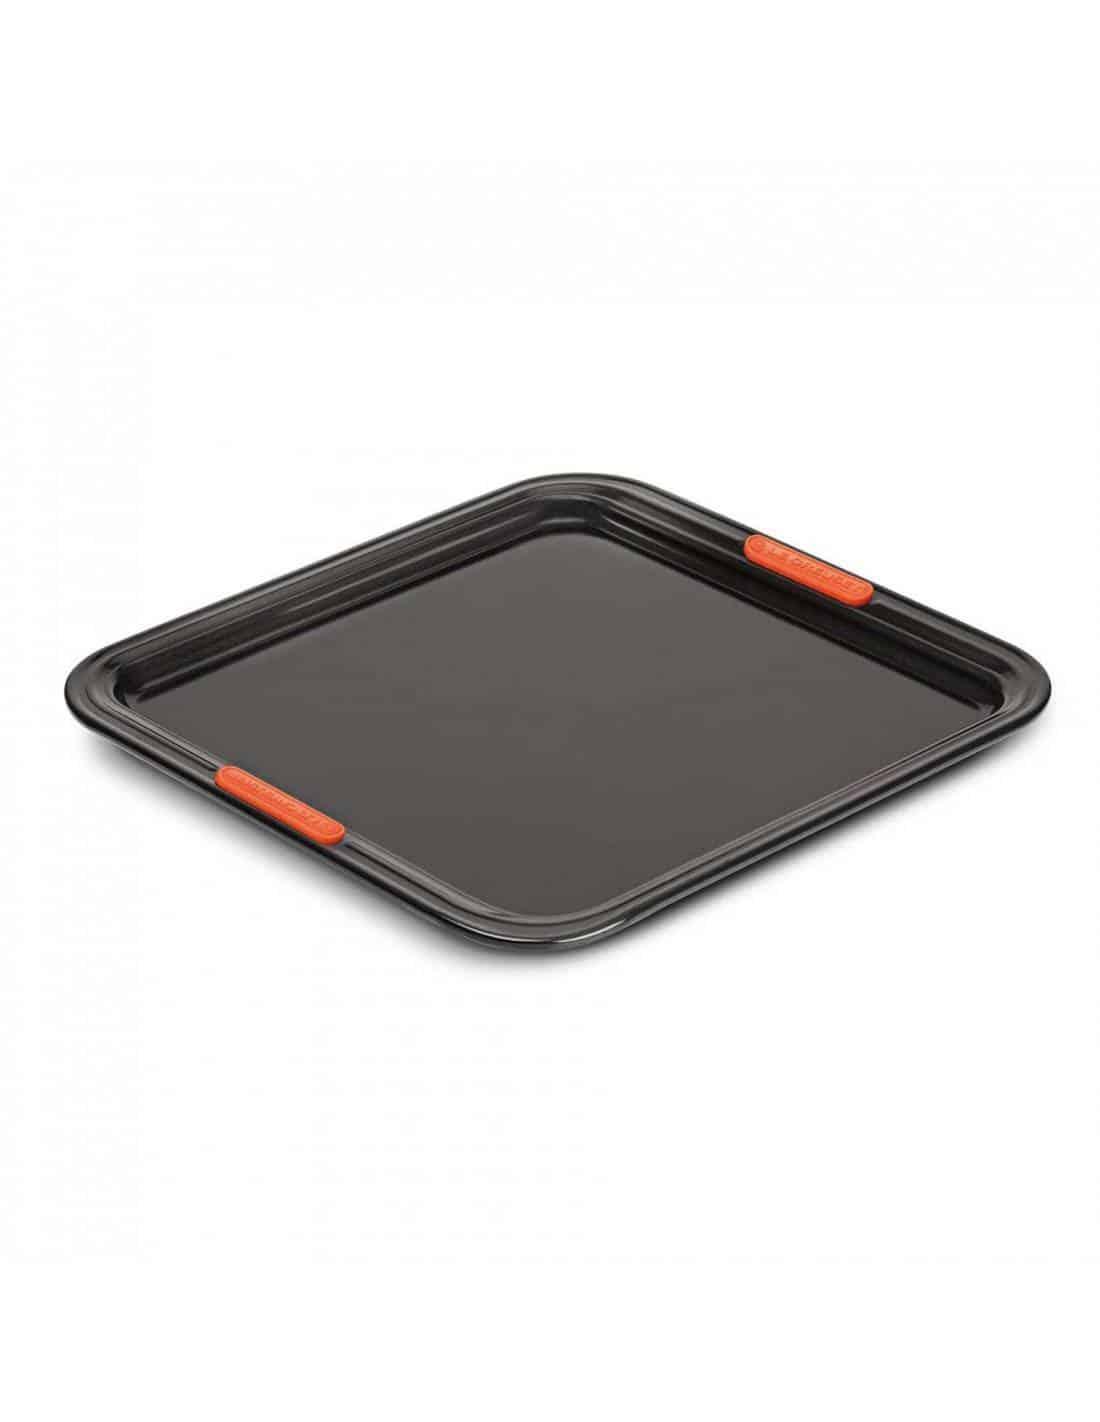 Bakeware & Ovenware Apprehensive Le Creuset Baking Trays X 2 Home, Furniture & Diy